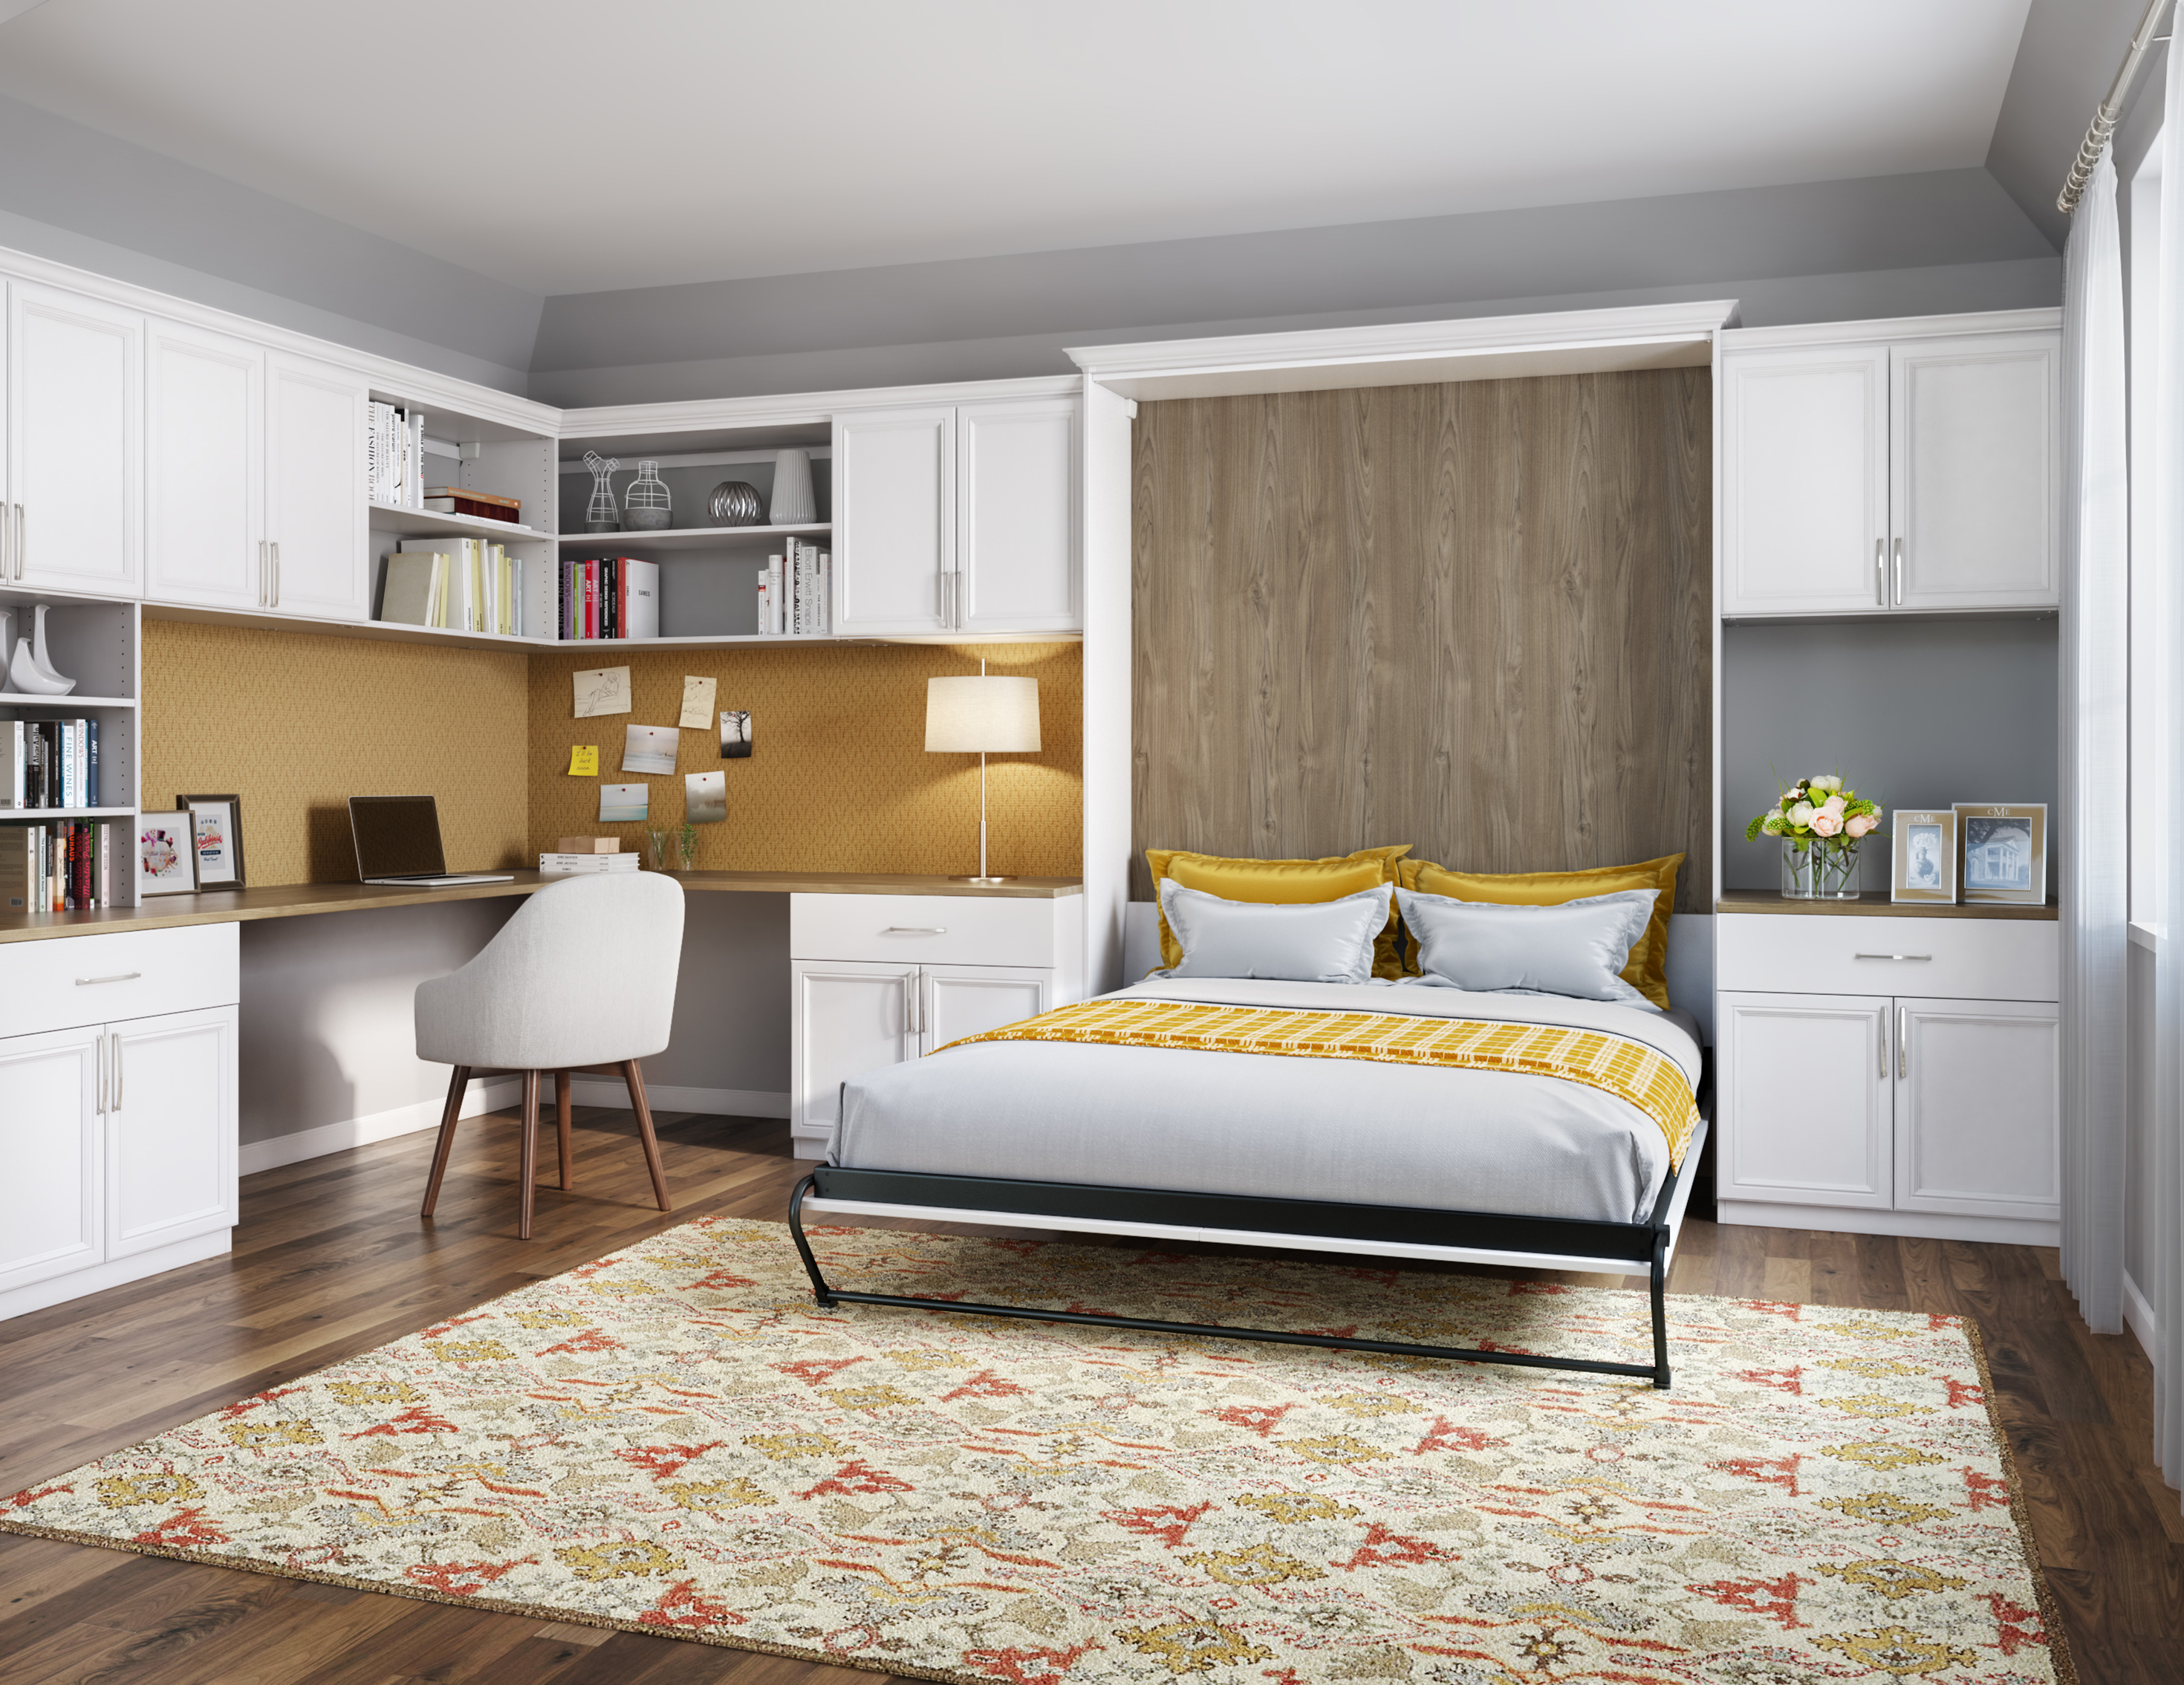 Murphy Bed.Murphy Beds In Windsor California Closets